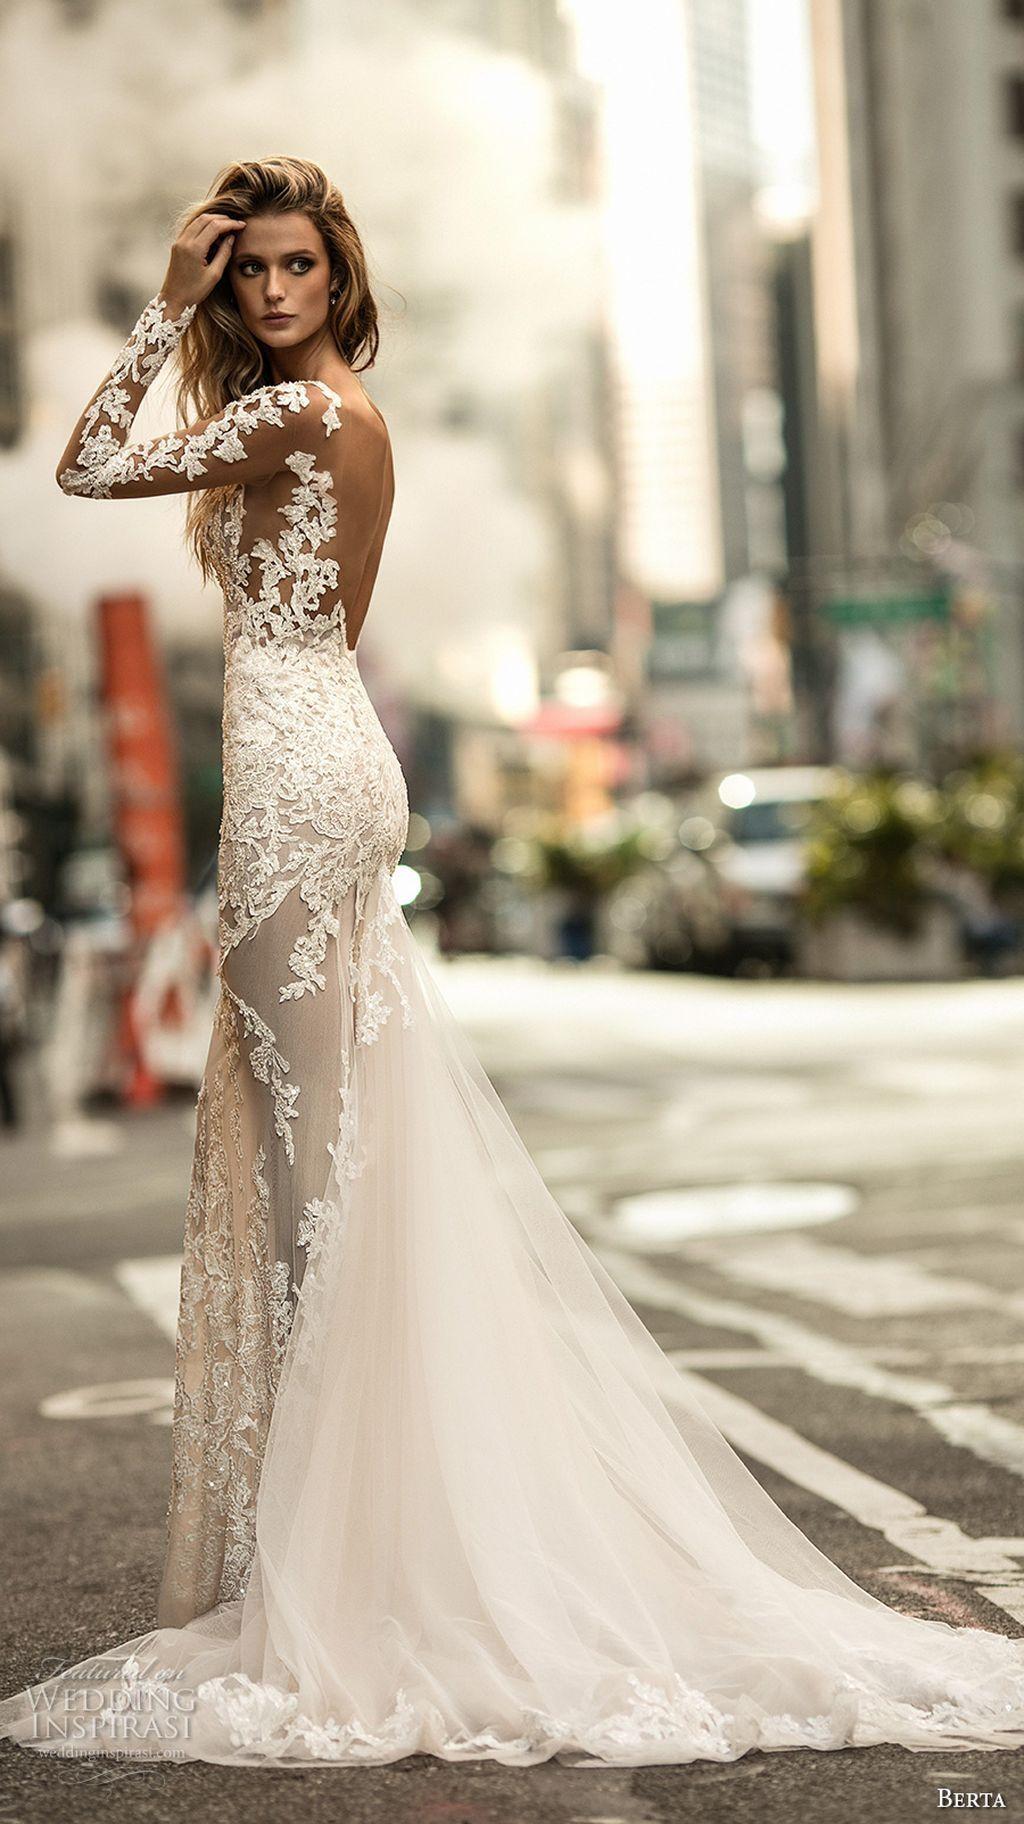 60 Totally Adorable Long Sleeve Winter Wedding Dress Ideas Every ...